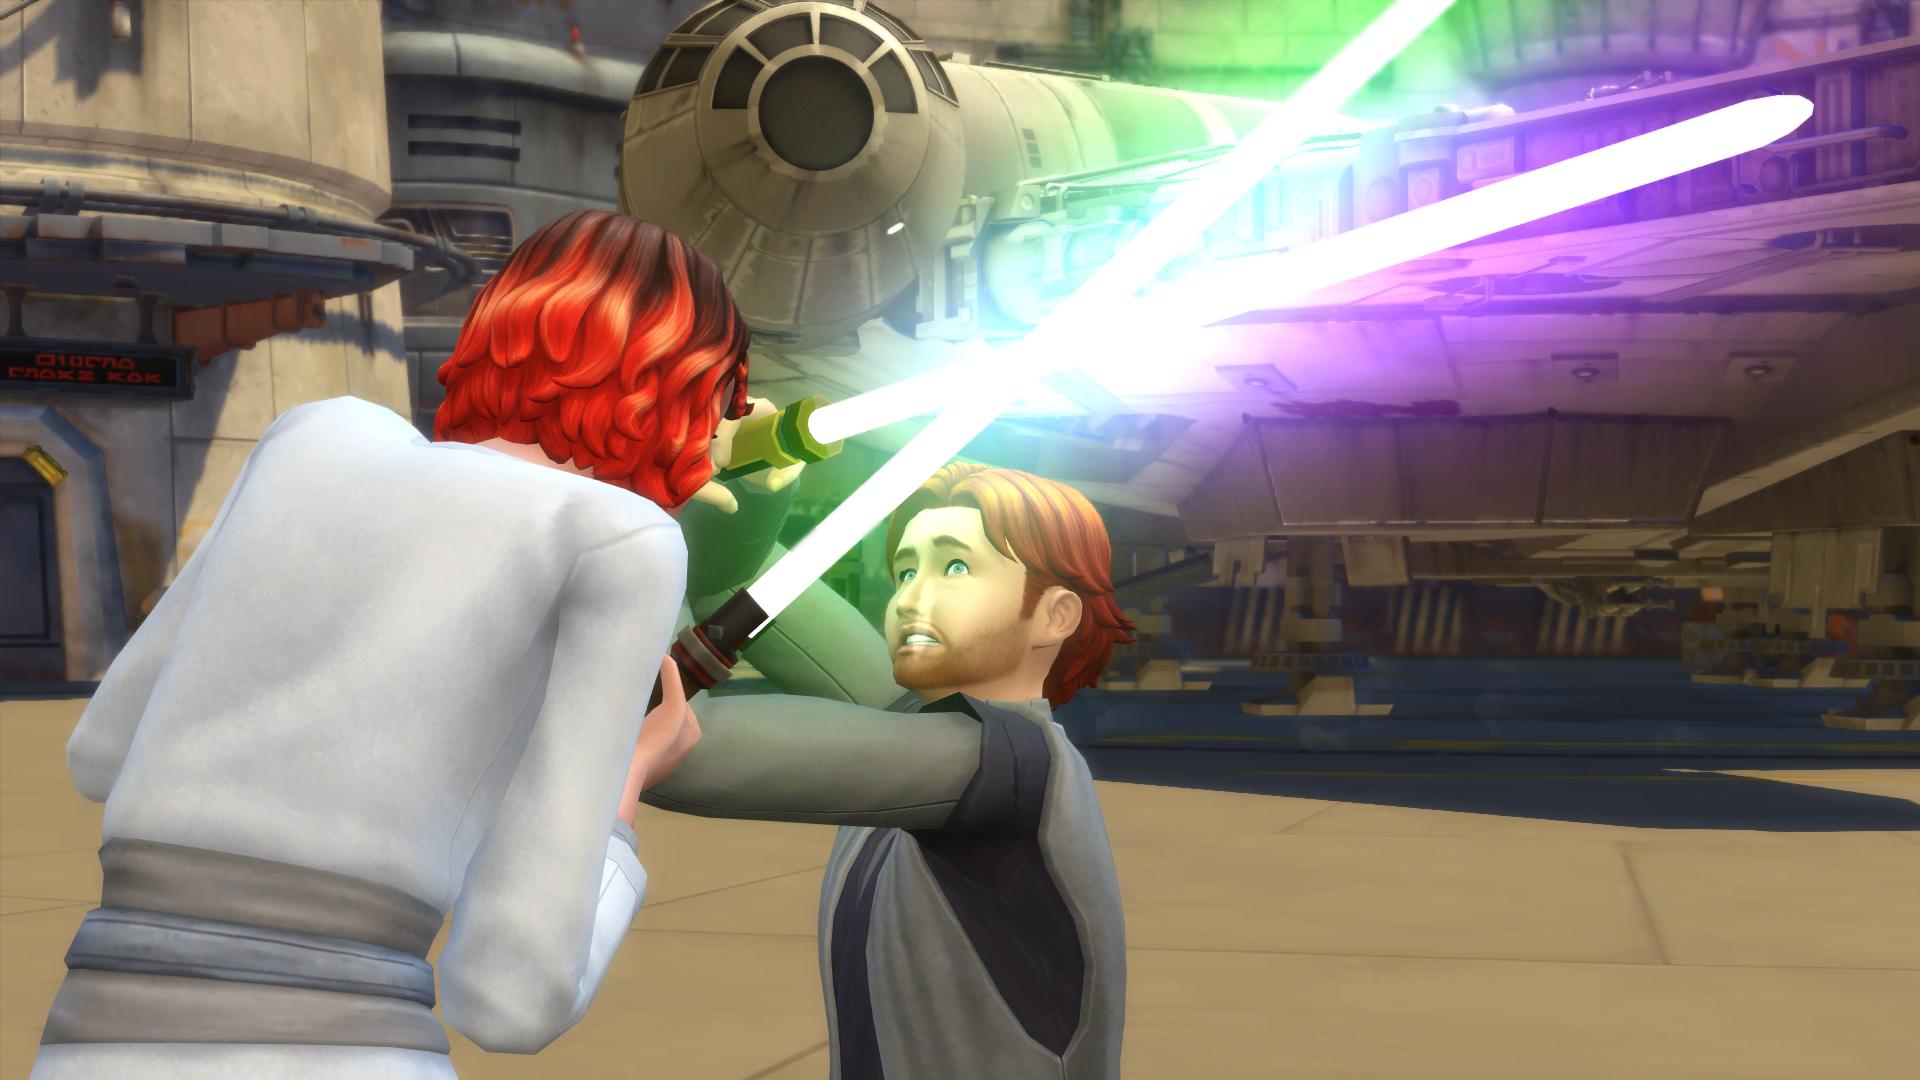 De Sims 4 Star Wars: Journey to Batuu